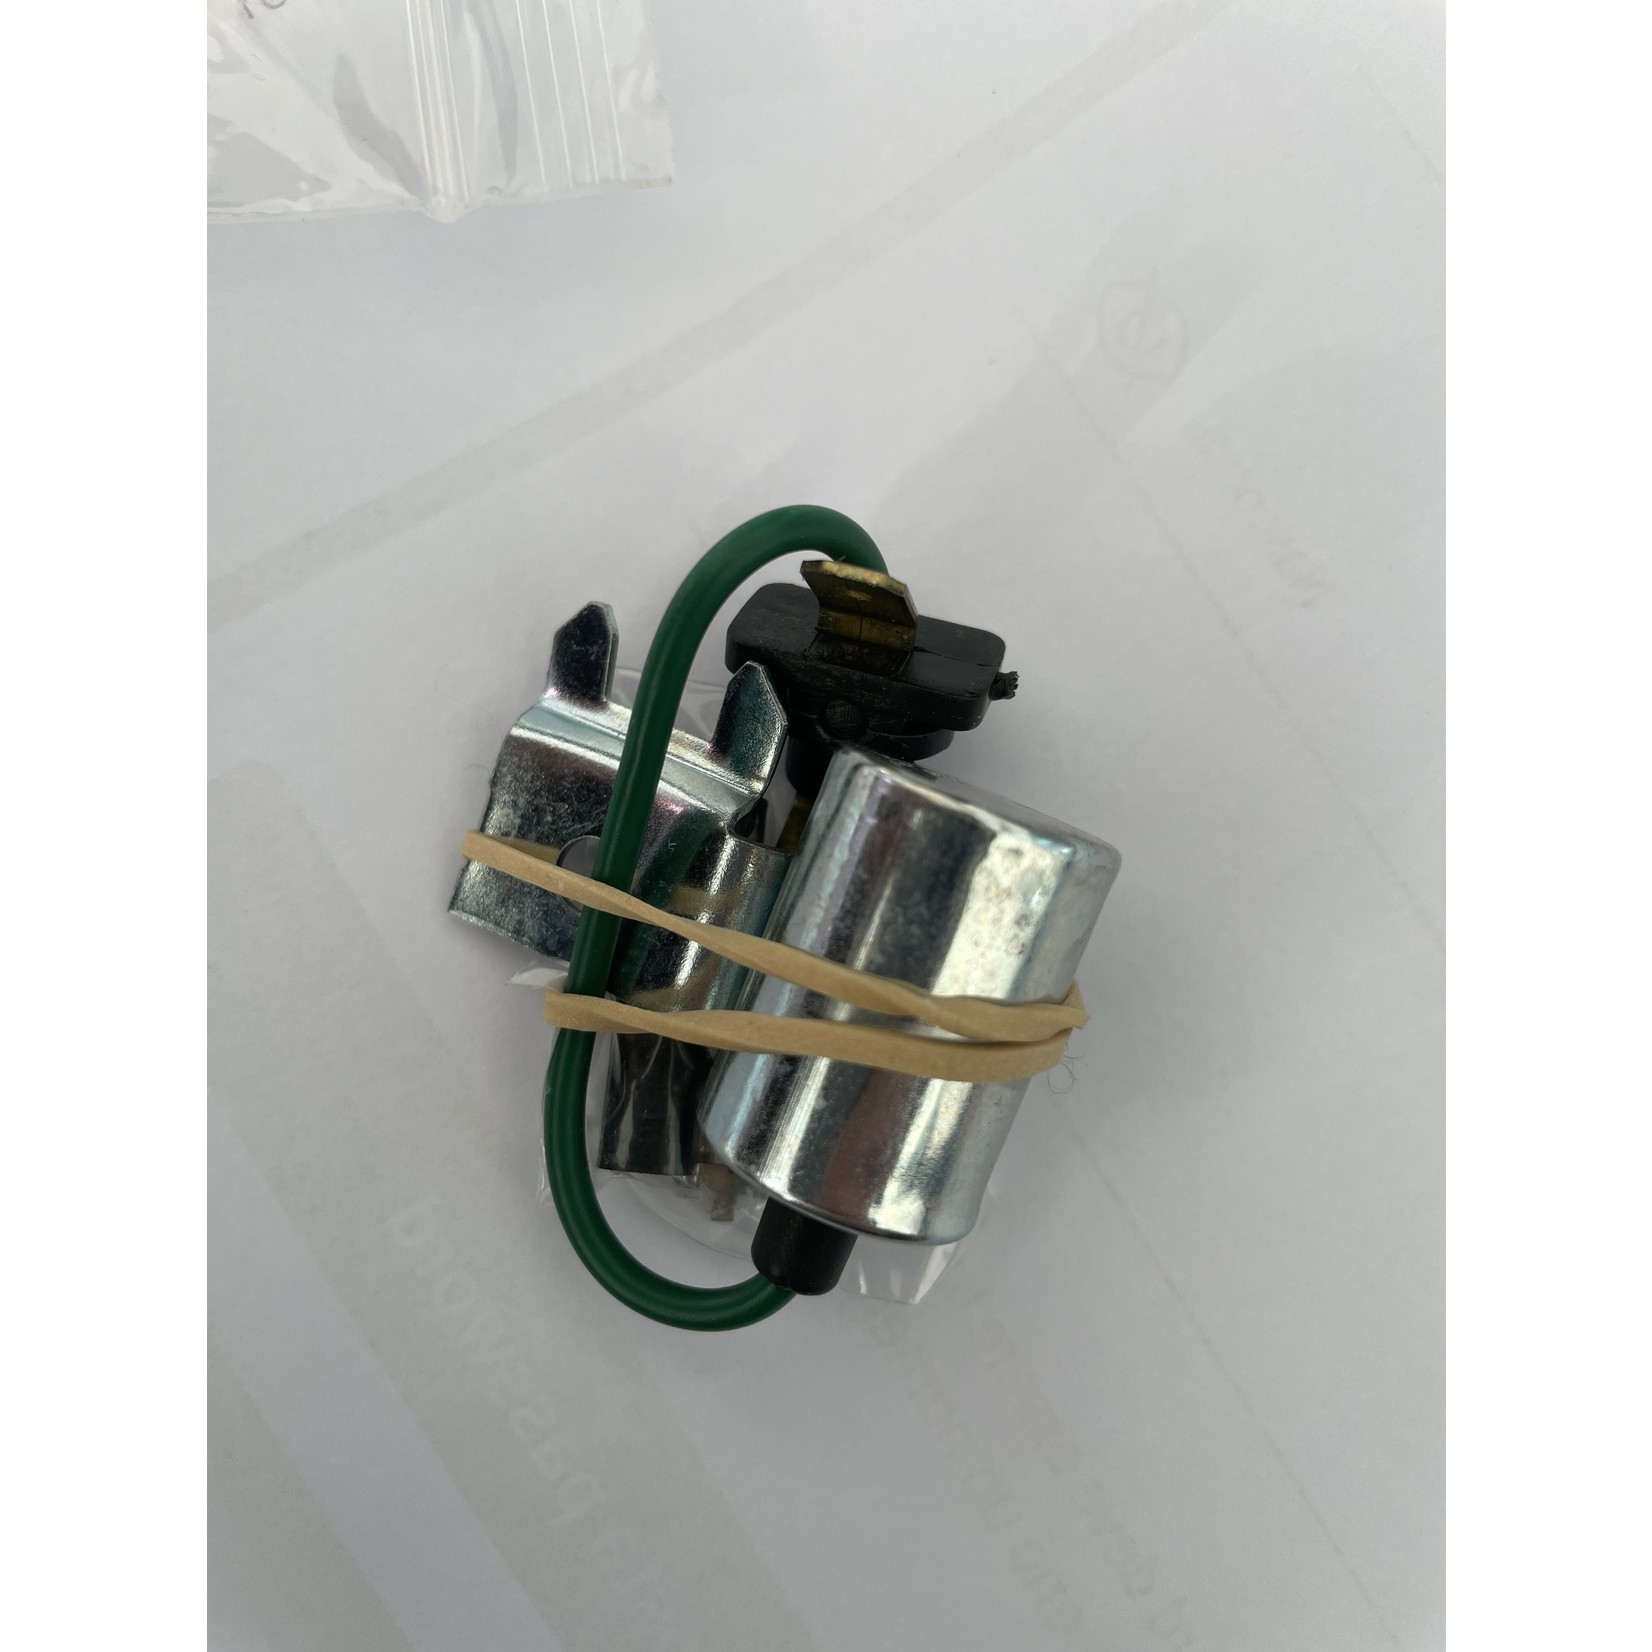 Condensateur Bosch Nr Org: DX211208A